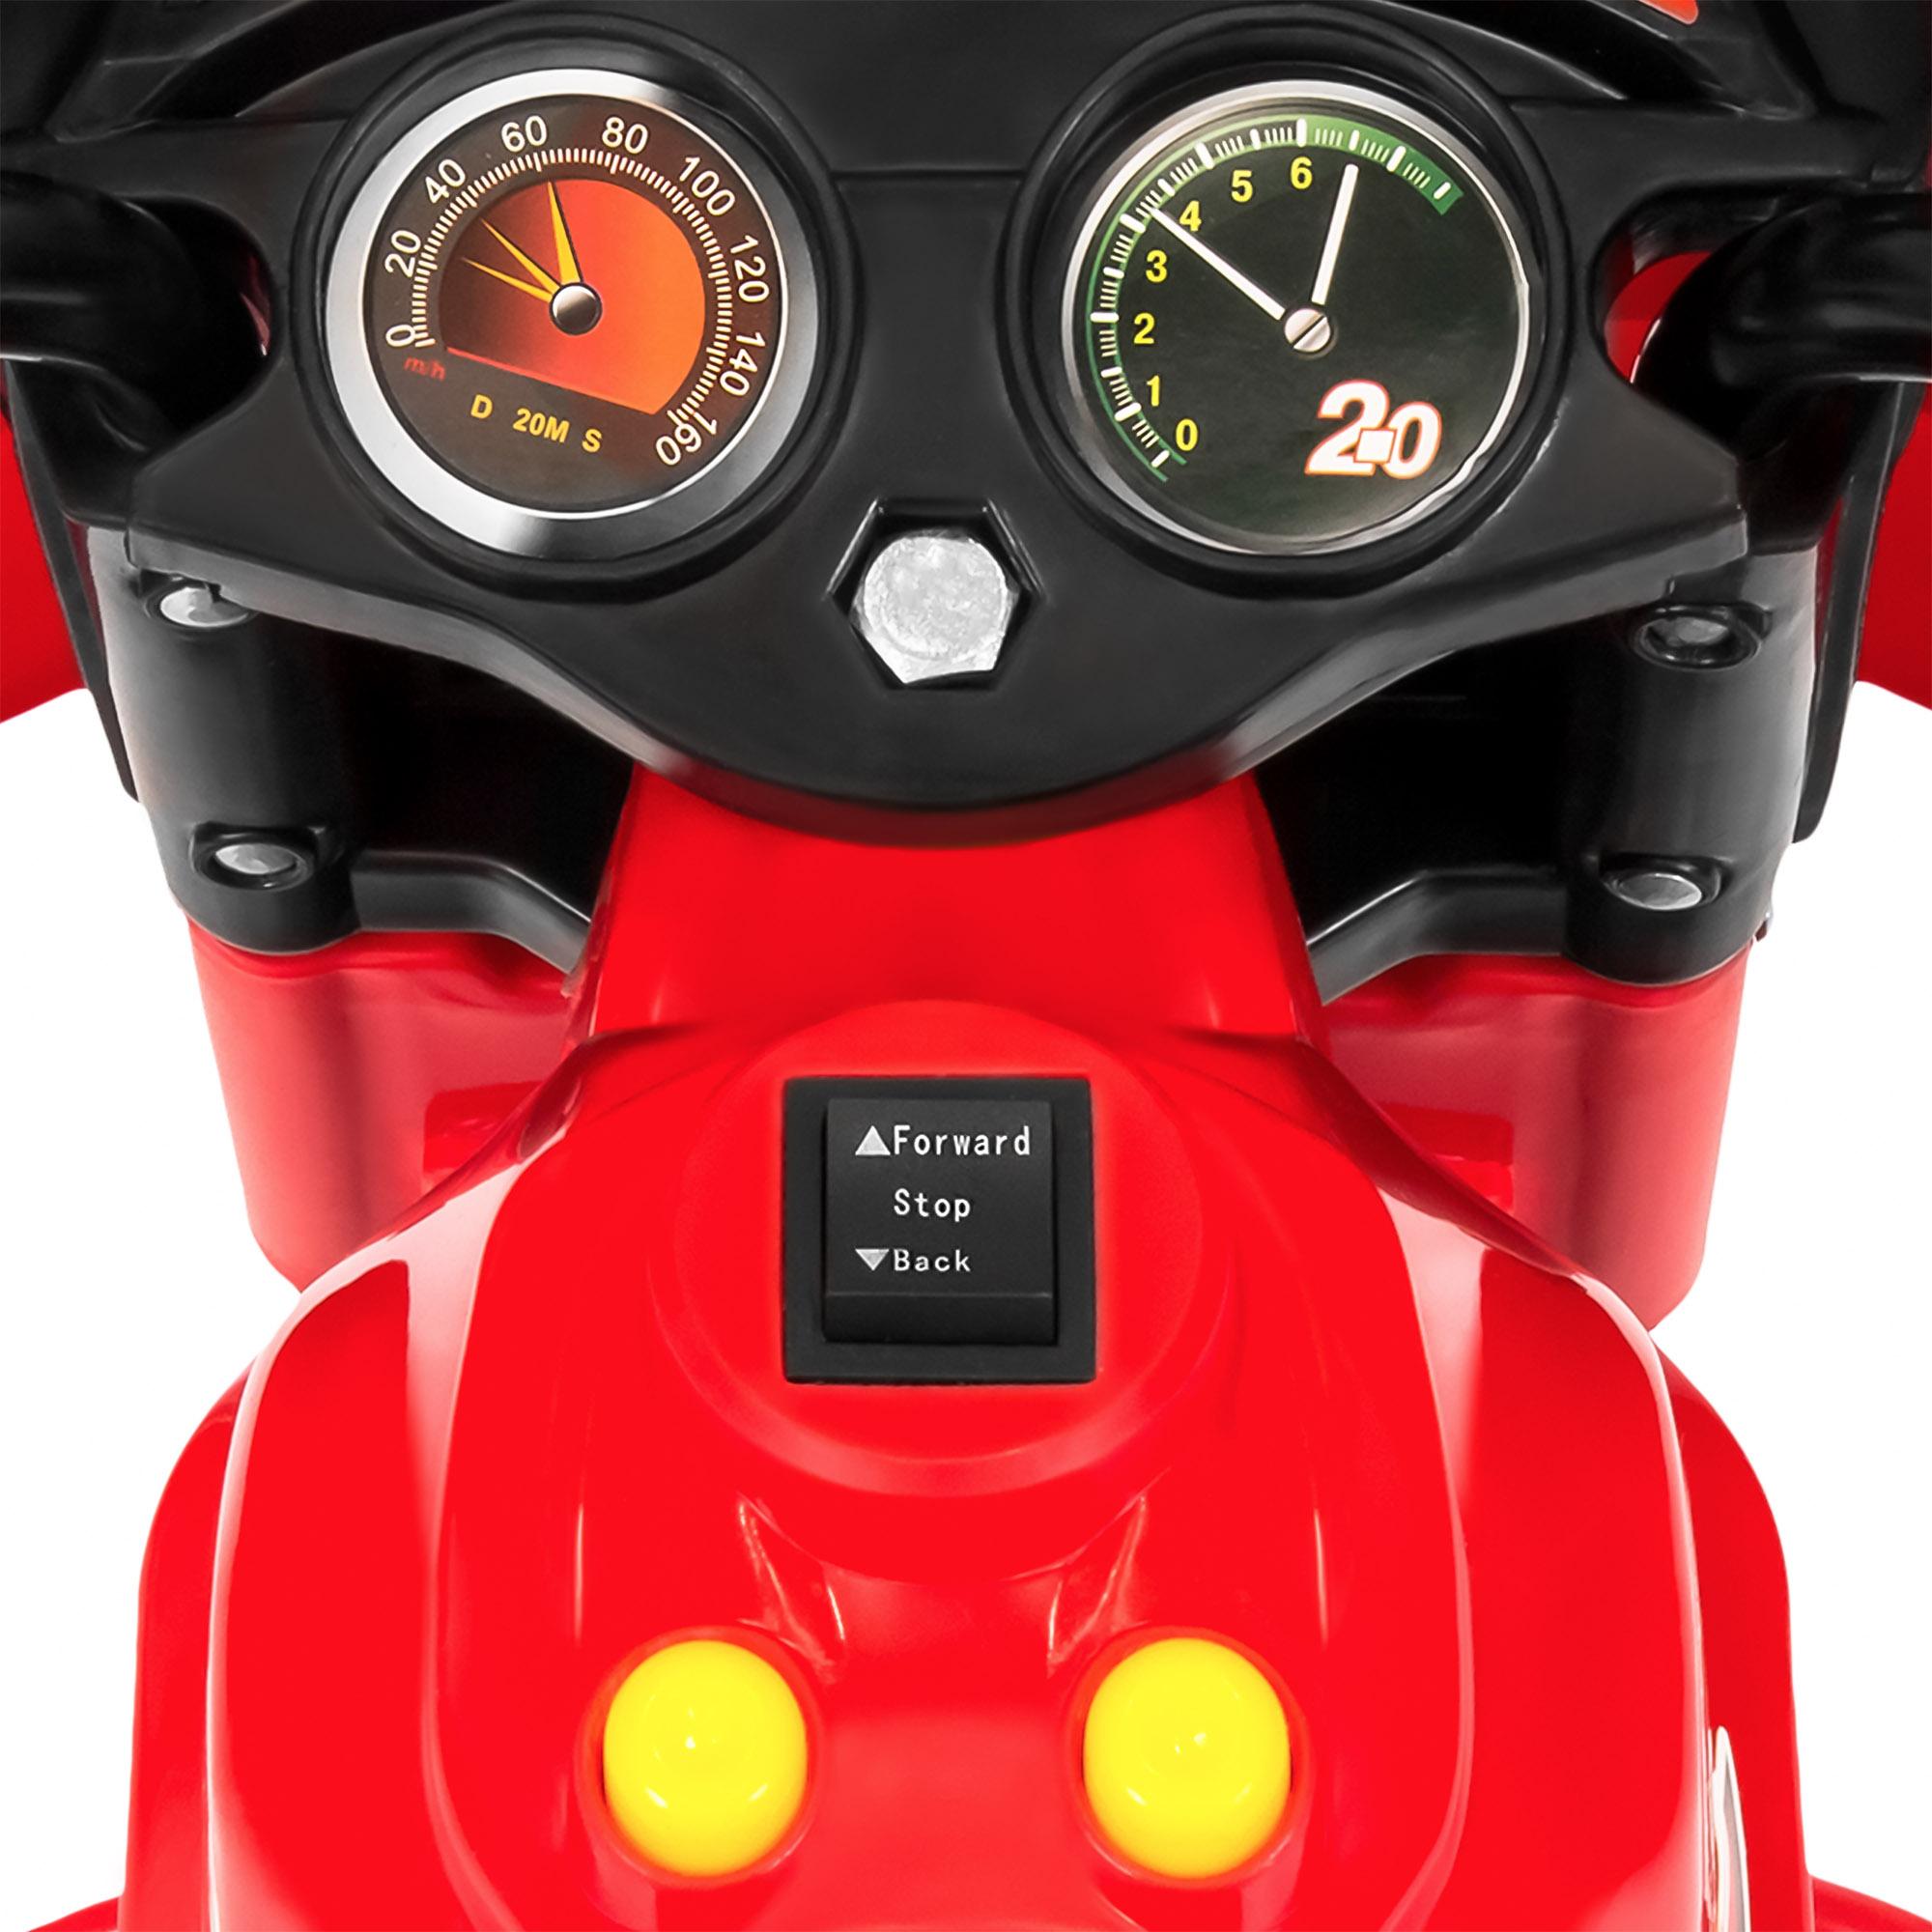 BCP-6V-Kids-3-Wheel-Motorcycle-Ride-On-Toy-w-LED-Lights-Music-Storage thumbnail 35